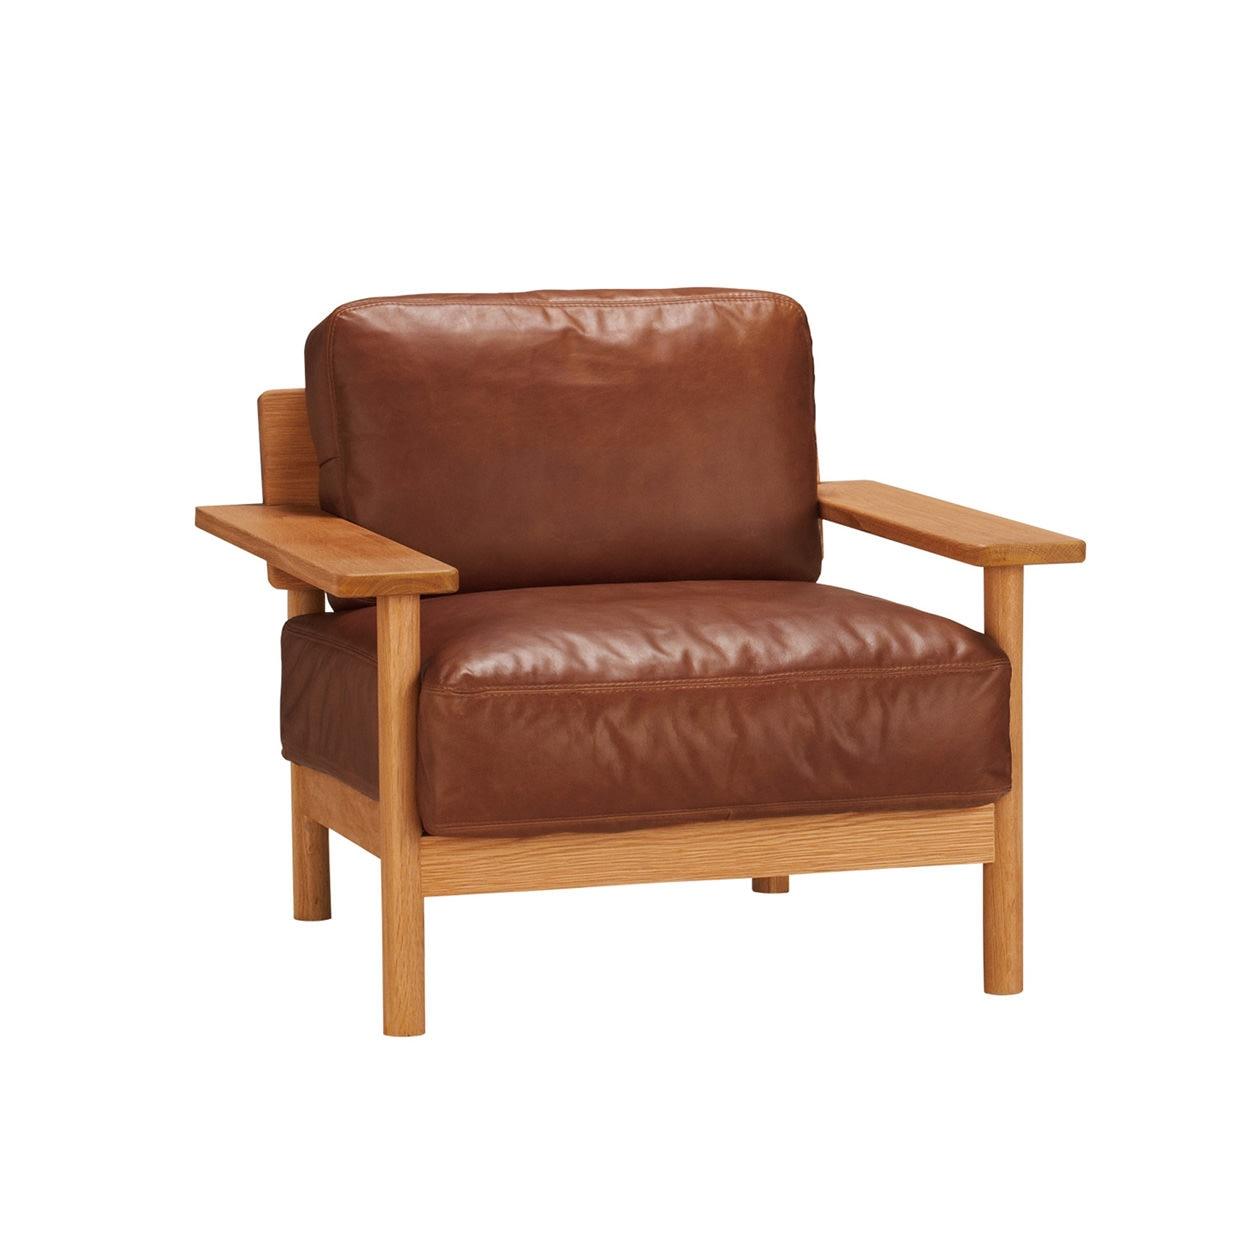 Surprising Dimanche Leather Sofa Muji Bralicious Painted Fabric Chair Ideas Braliciousco